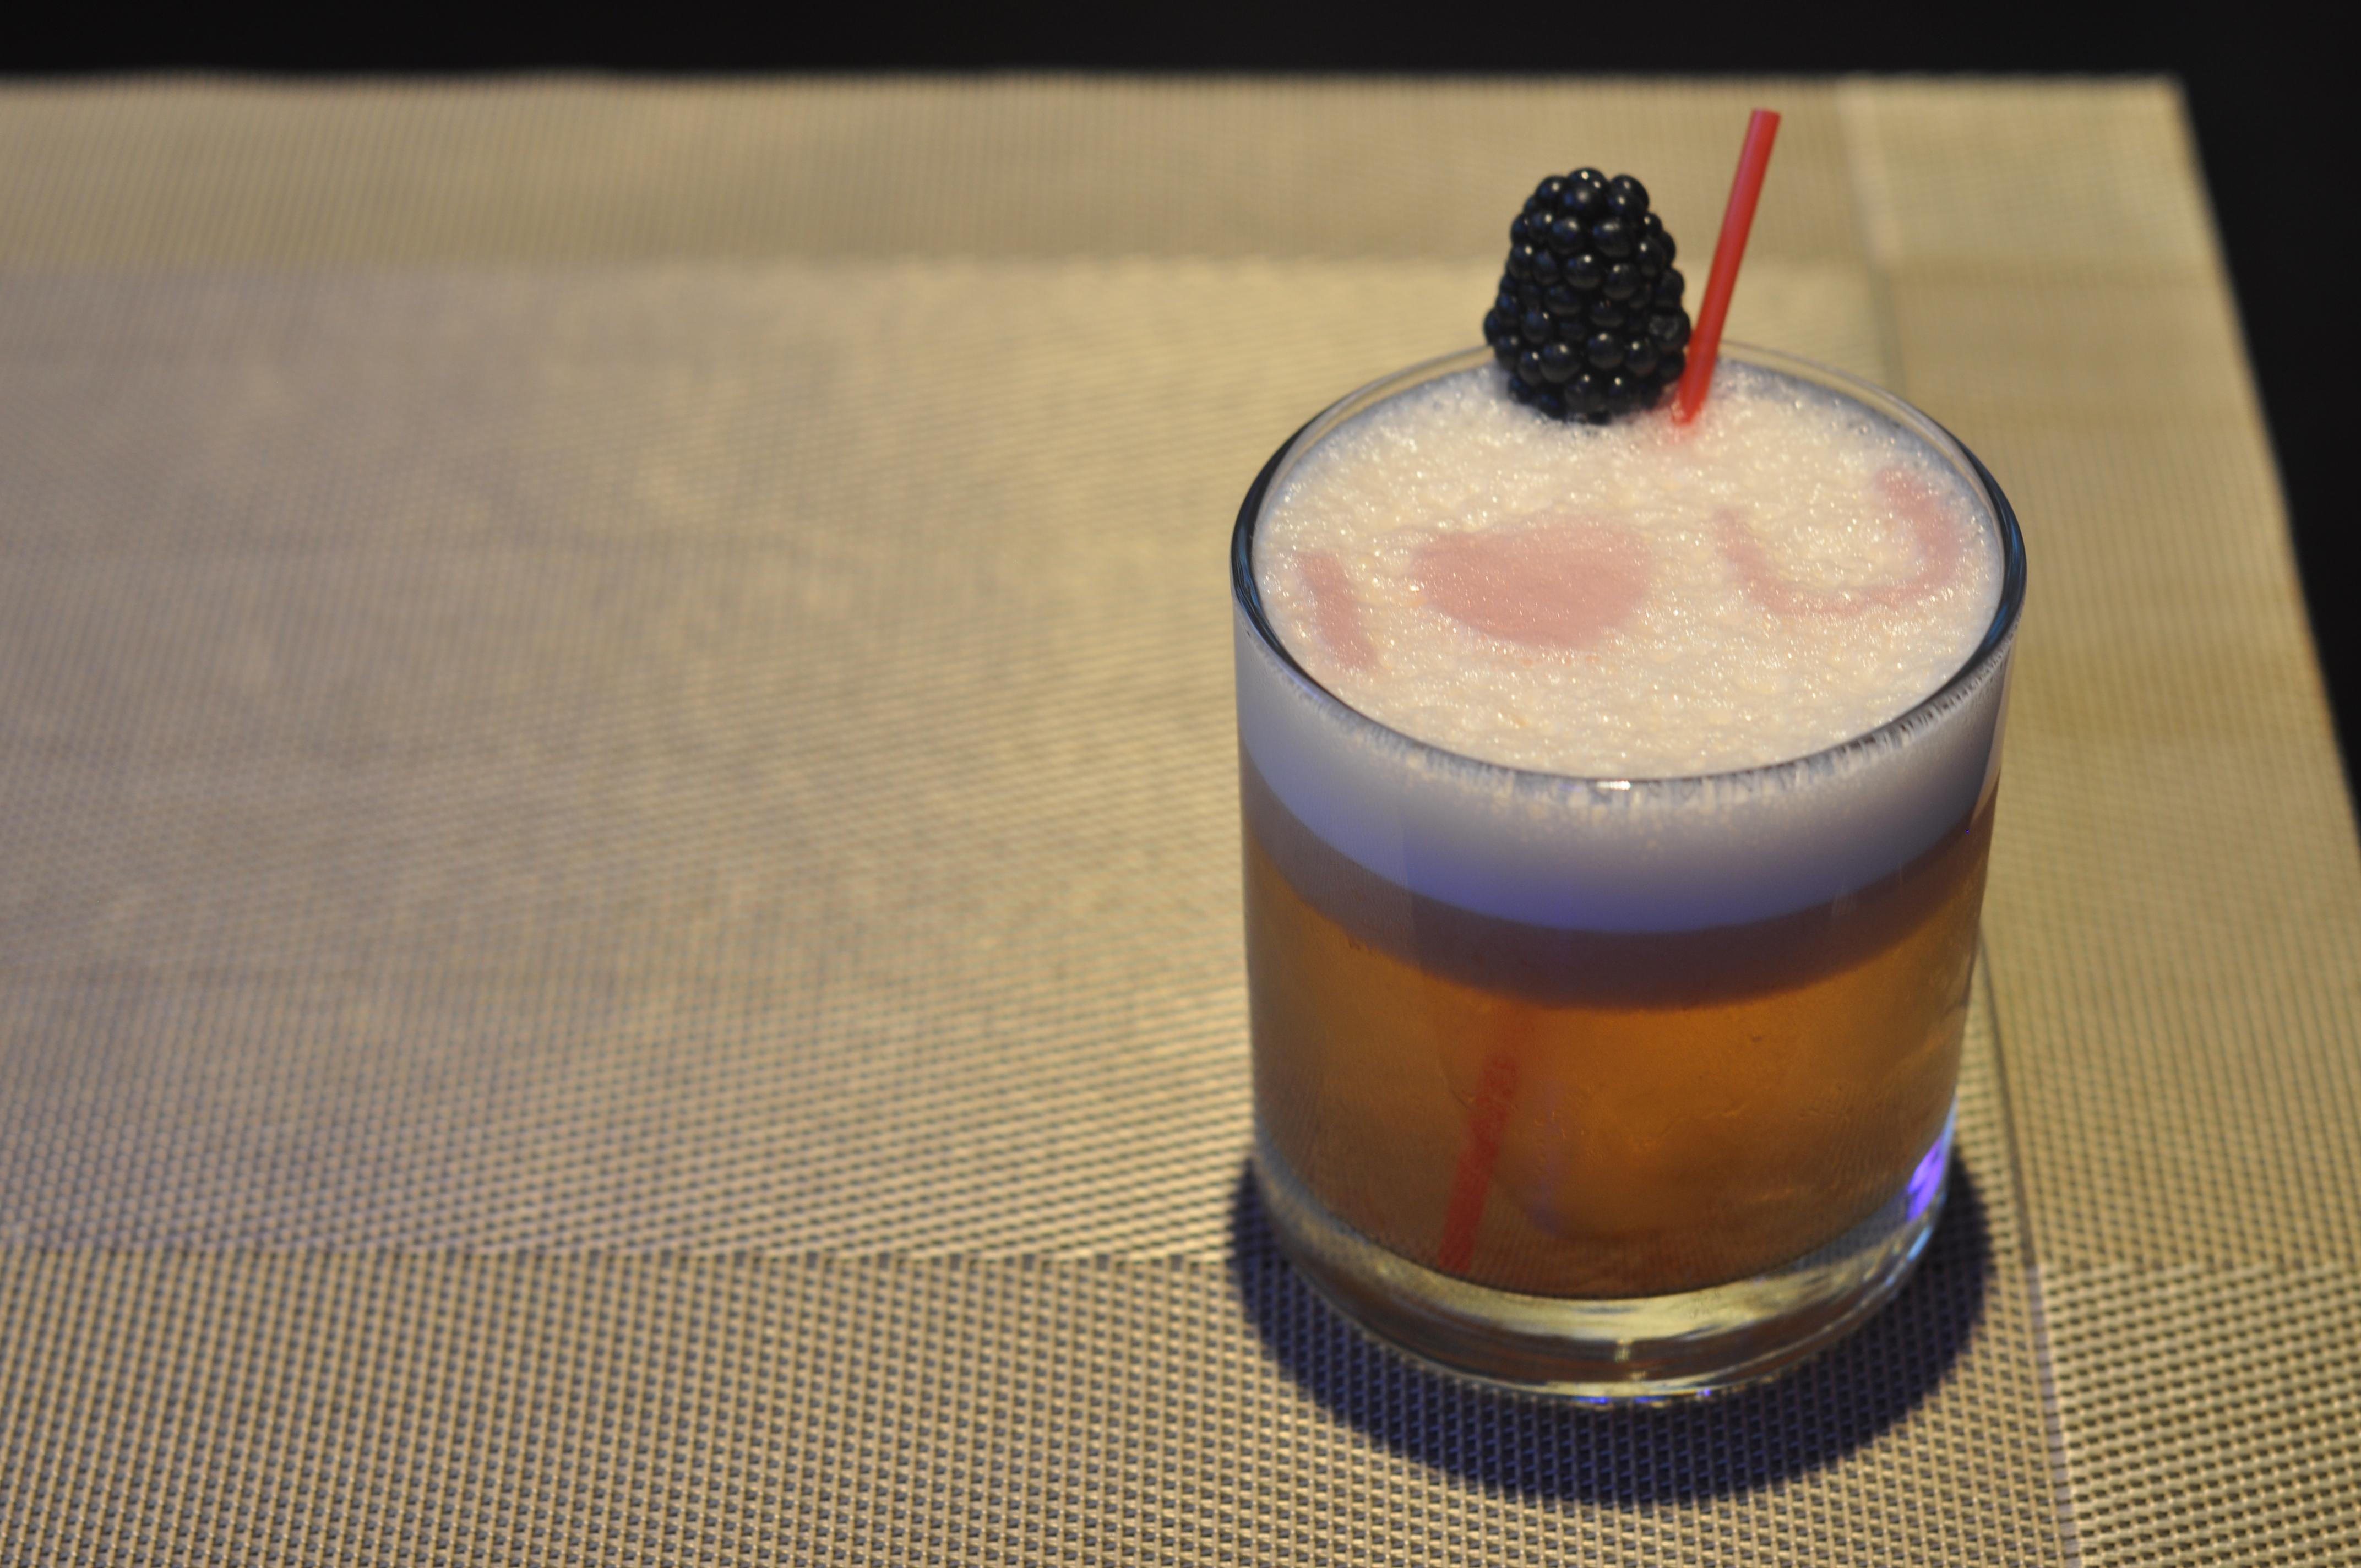 Luna Asian Bistro & Lounge 日本料理 image 22